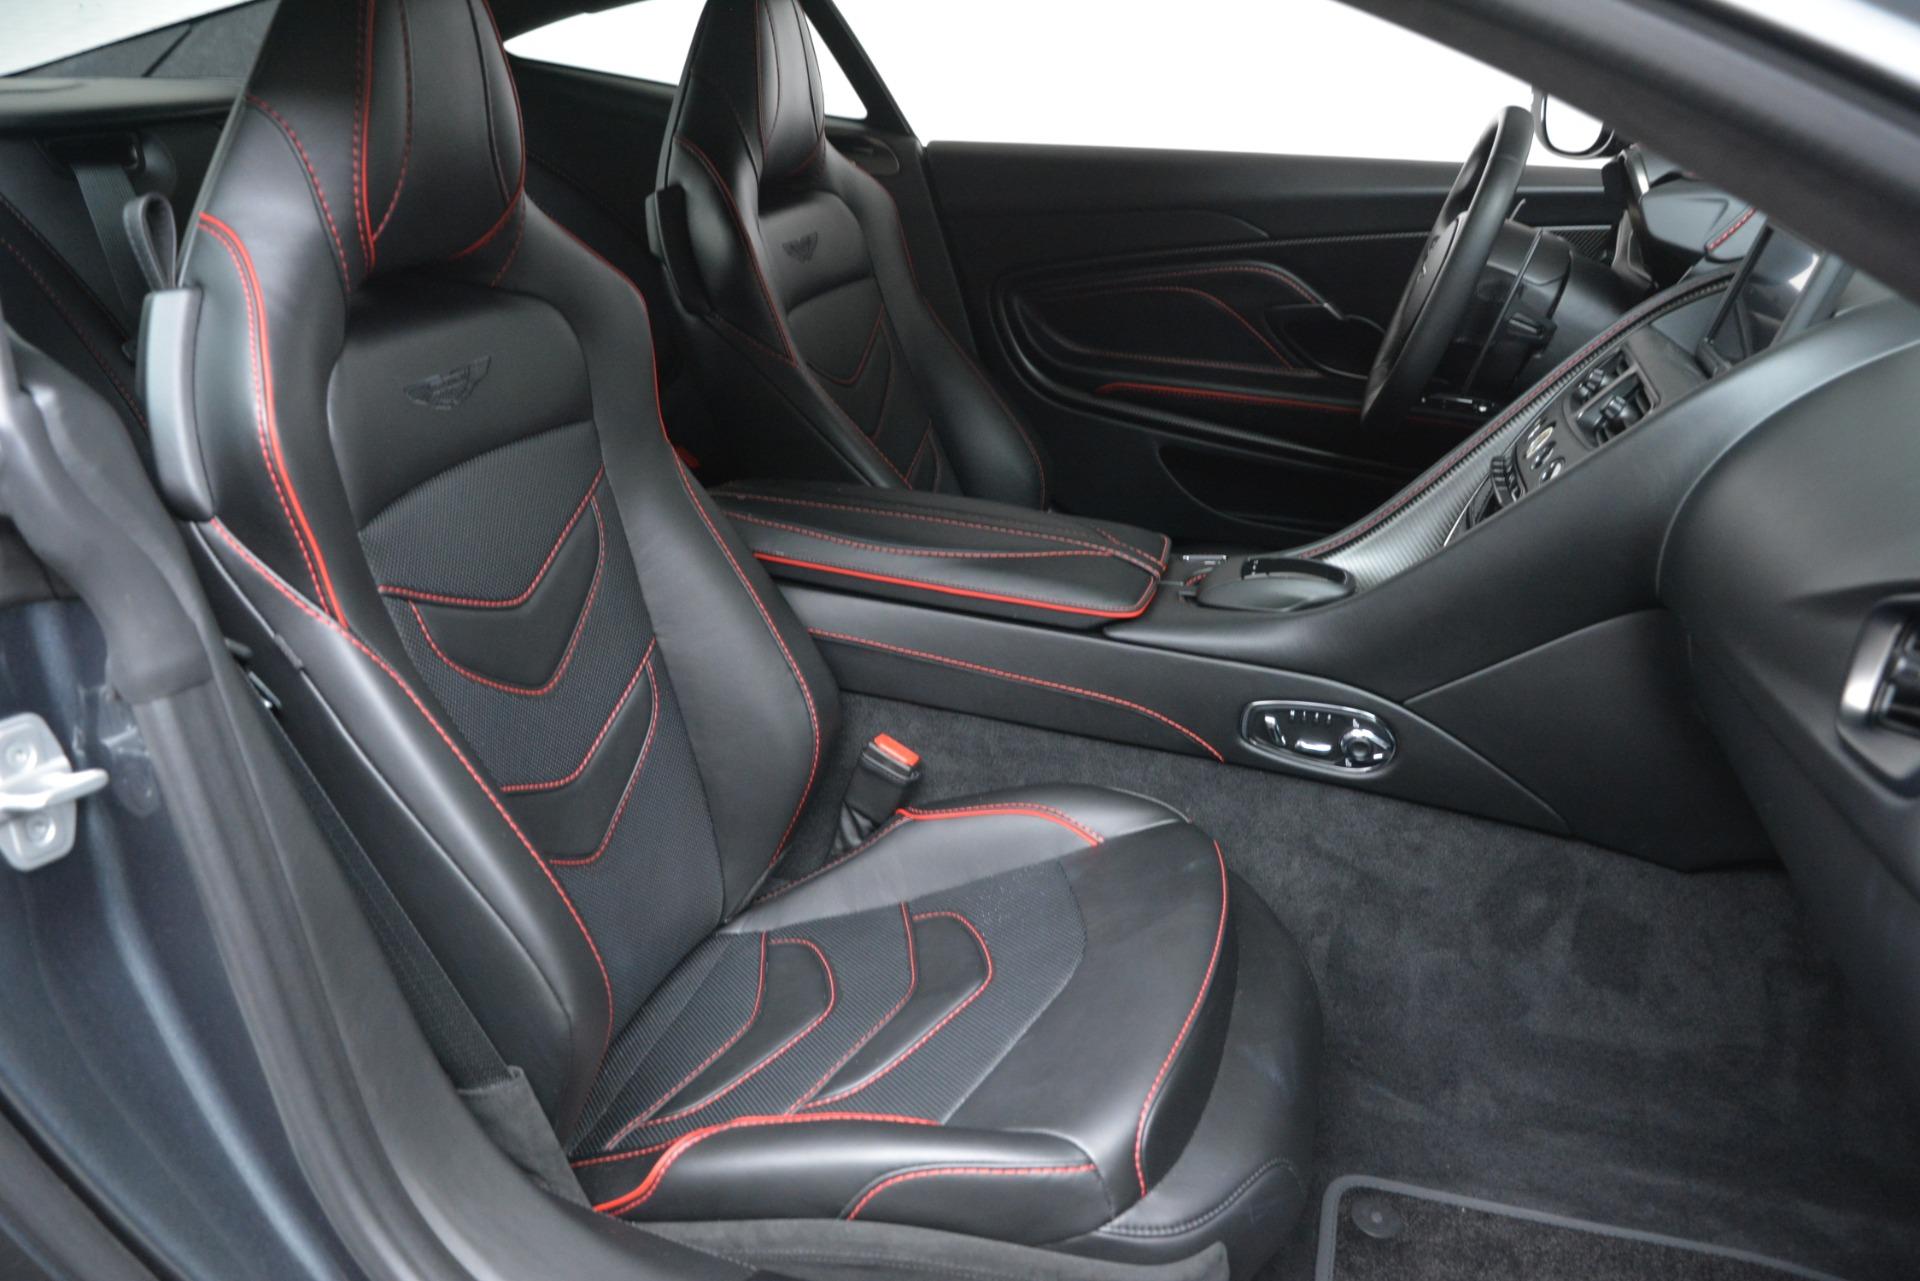 New 2019 Aston Martin DBS Superleggera Coupe For Sale In Greenwich, CT 3318_p16